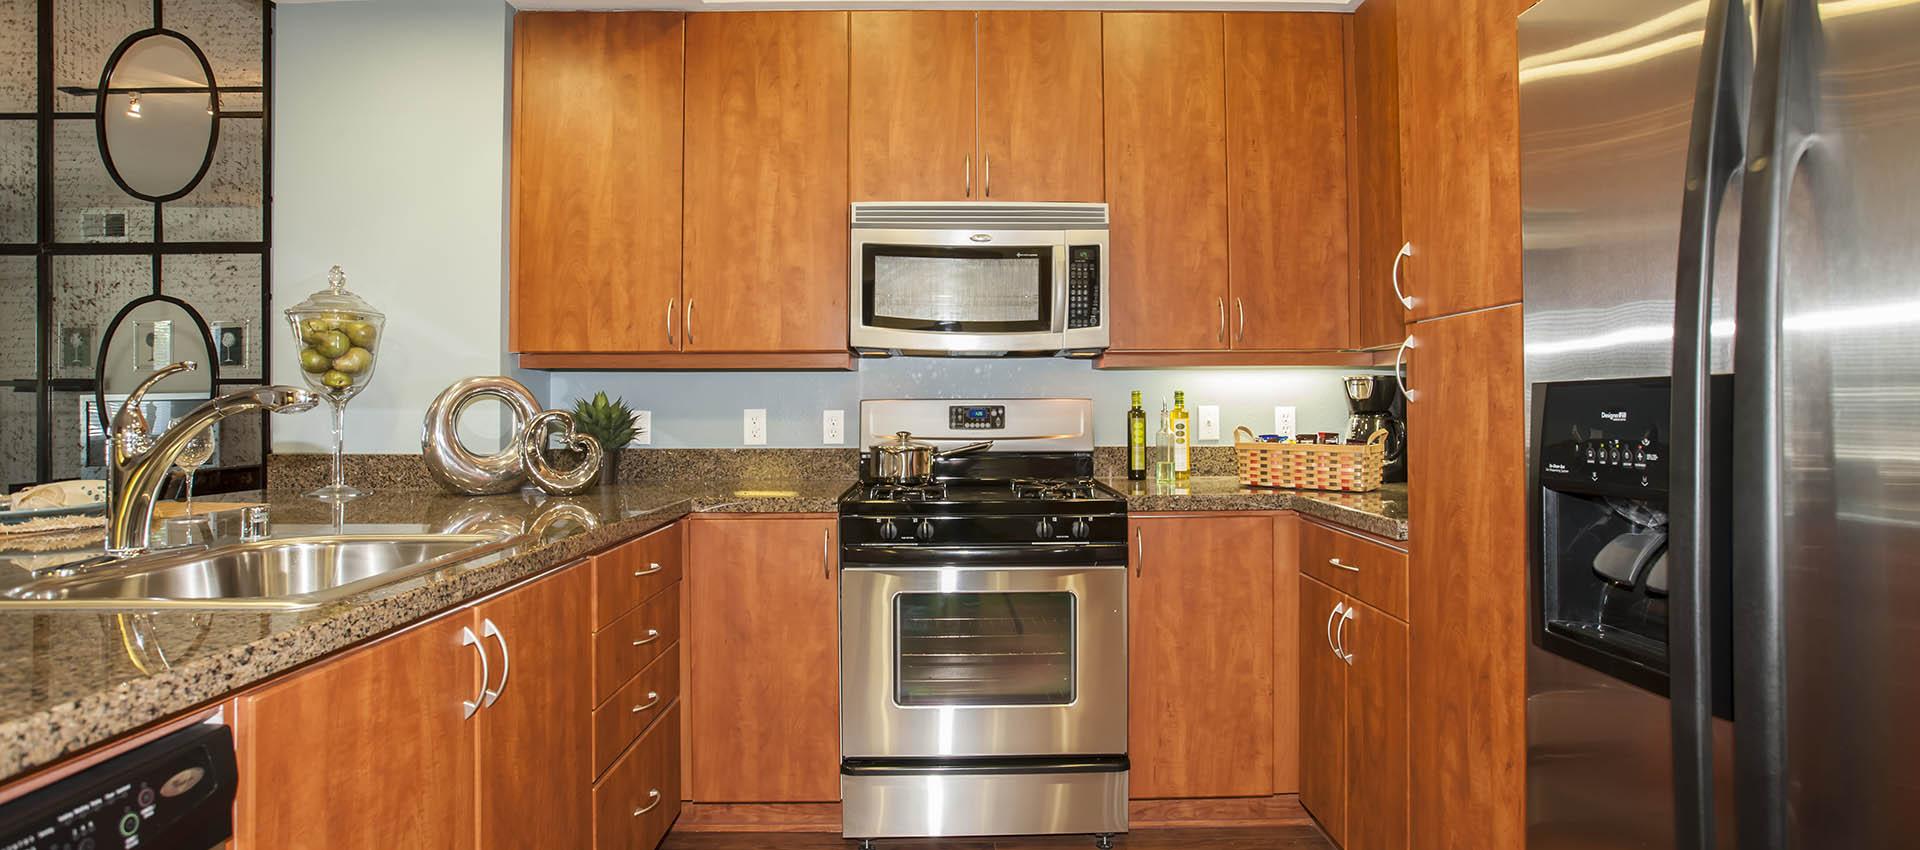 Kitchen Cabinets Petaluma Ca